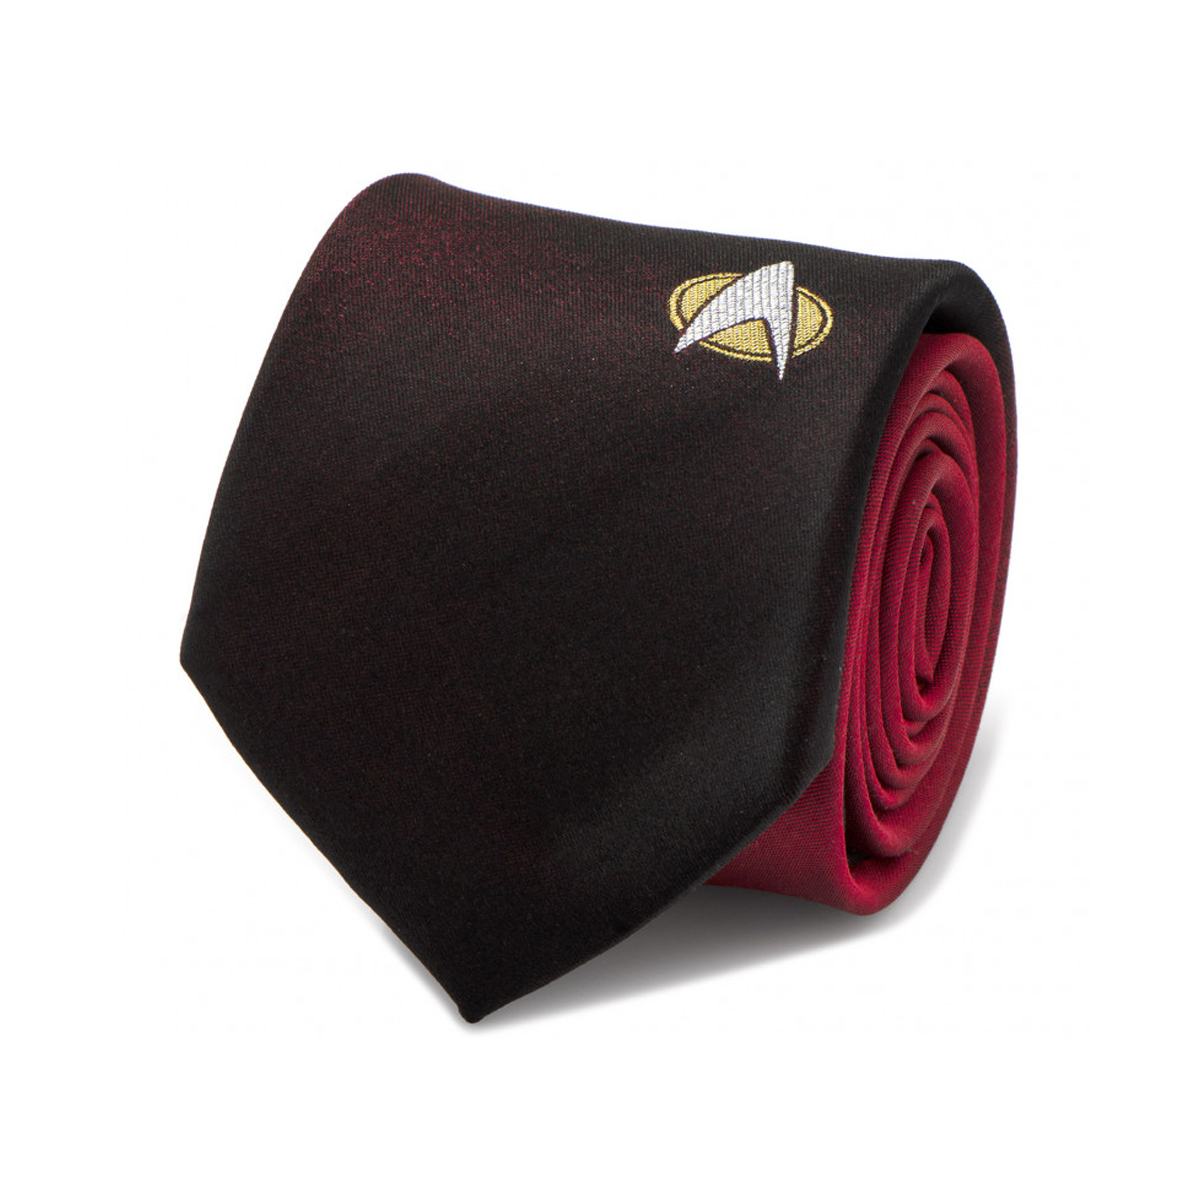 Star Trek The Next Generation Shield Red Ombre Men's Tie